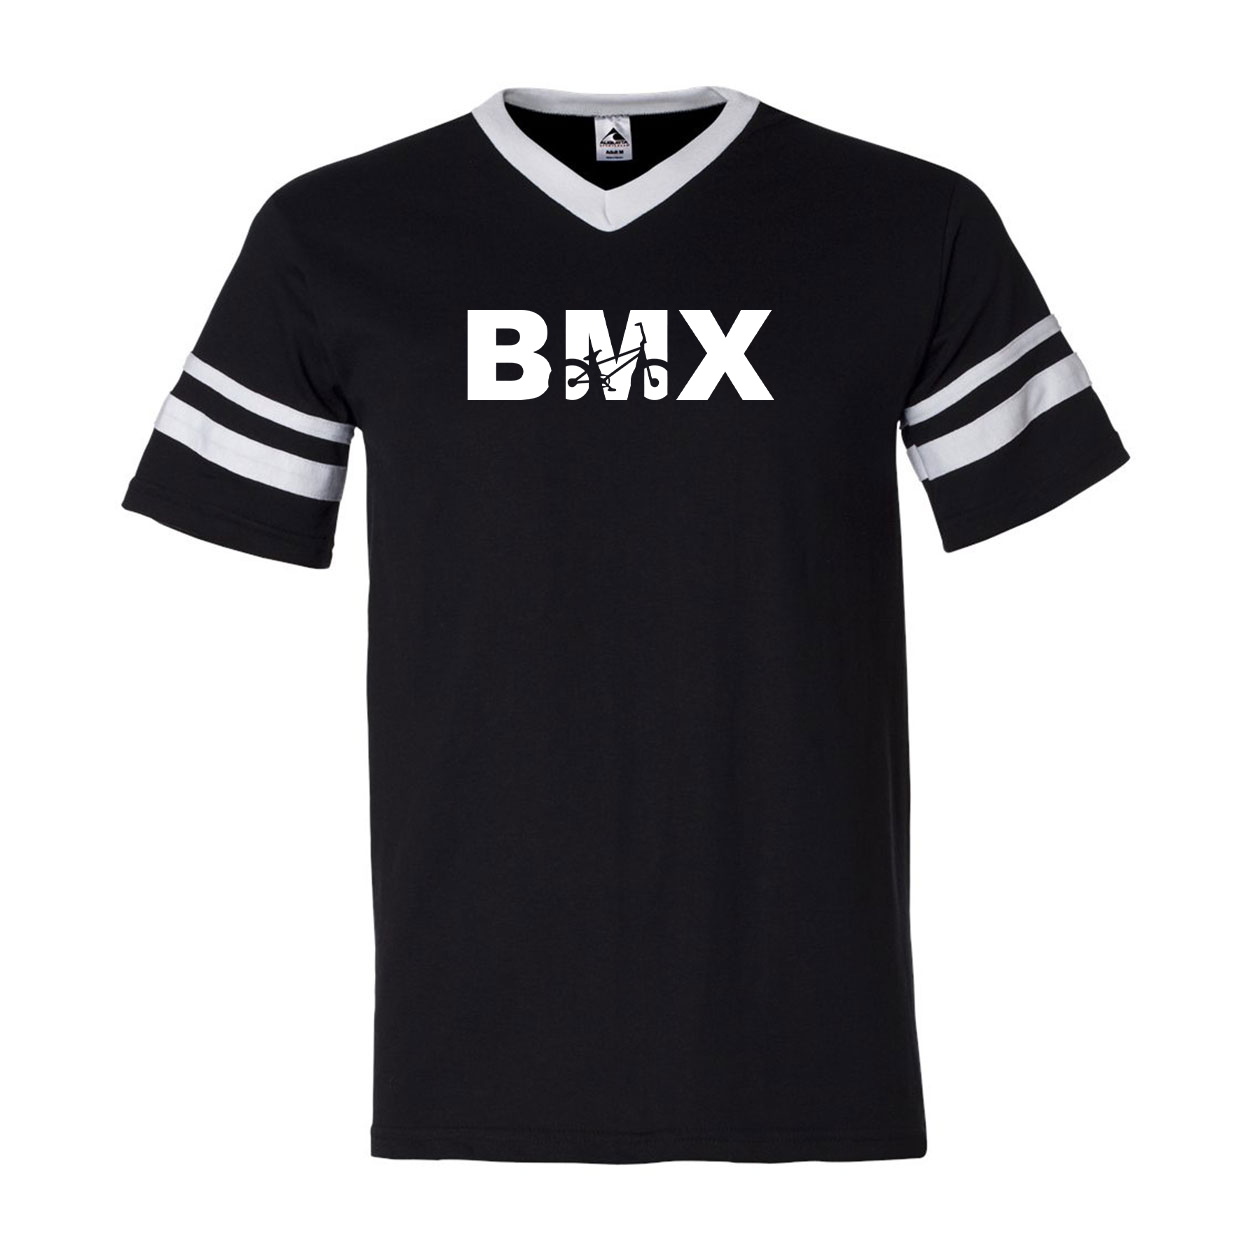 BMX Bike Logo Classic Premium Striped Jersey T-Shirt Black/White (White Logo)